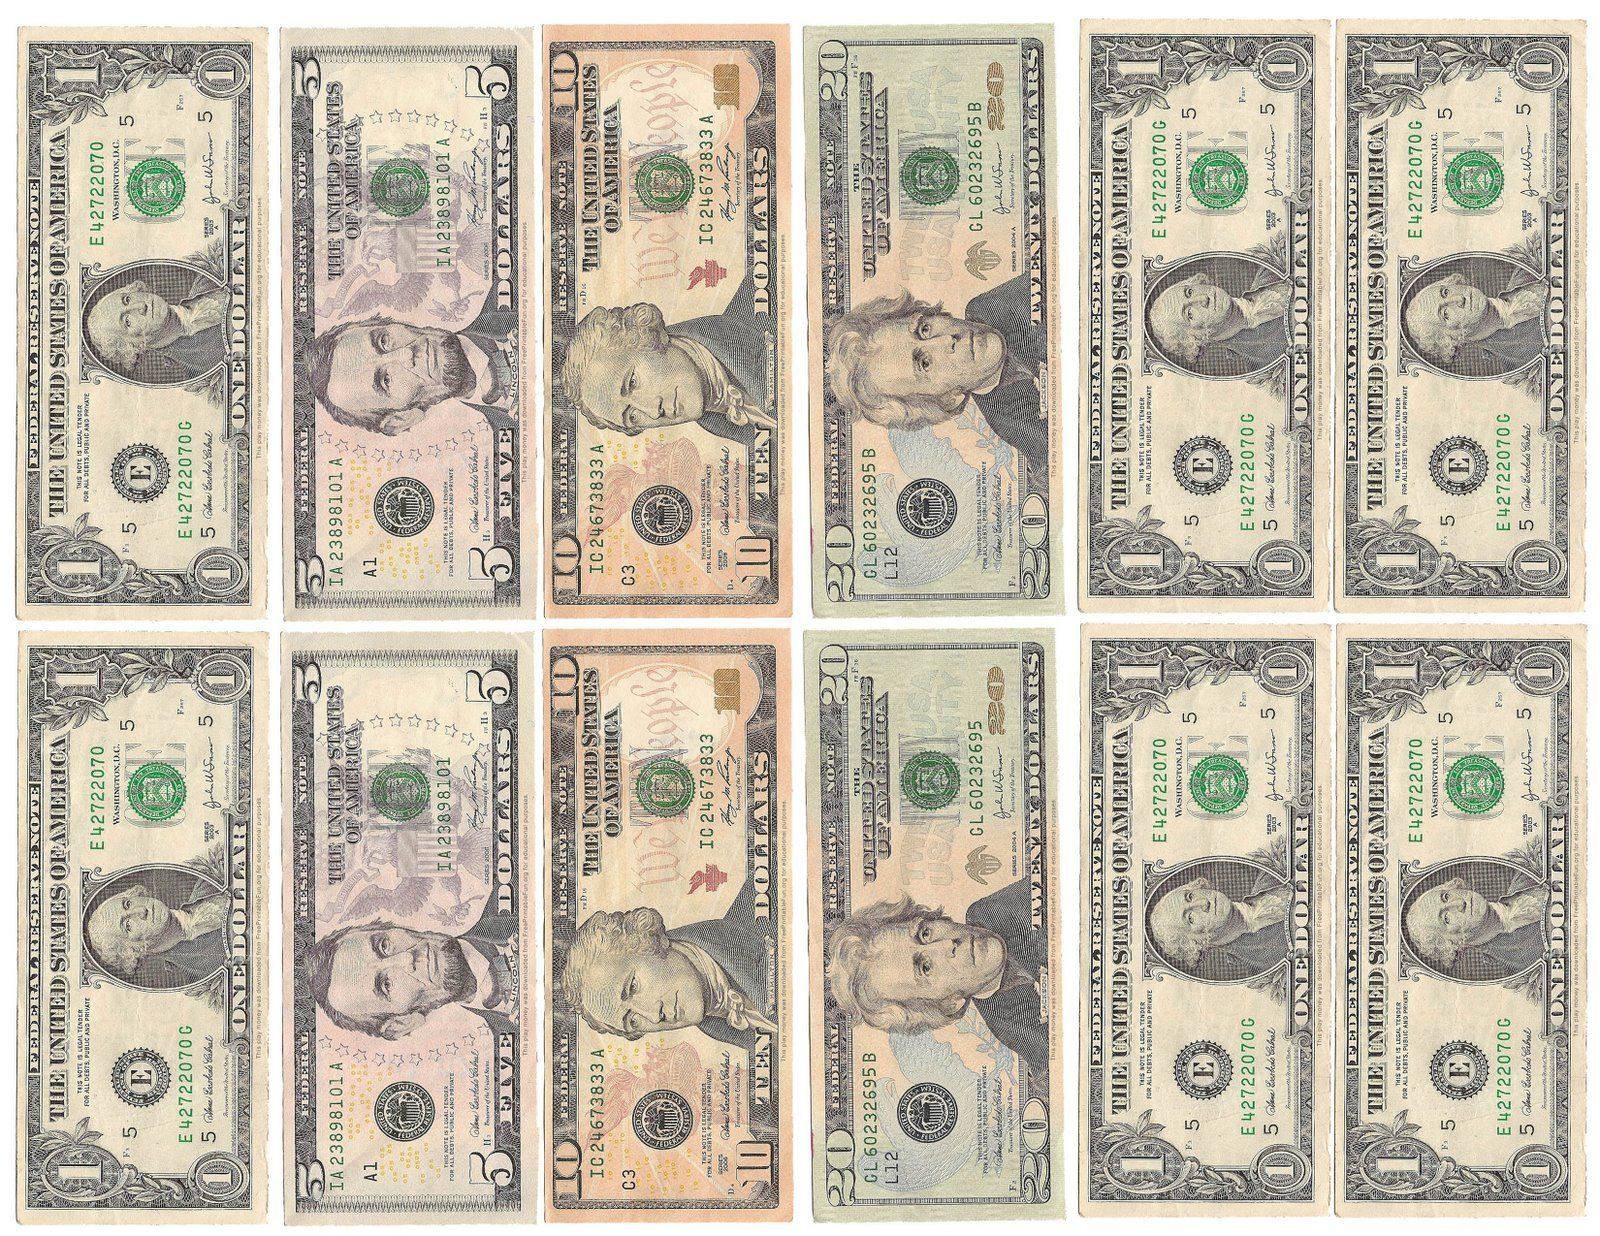 Money Money Money! | Kid's Room | Pinterest | Printable Play Money - Free Printable Fake Money That Looks Real